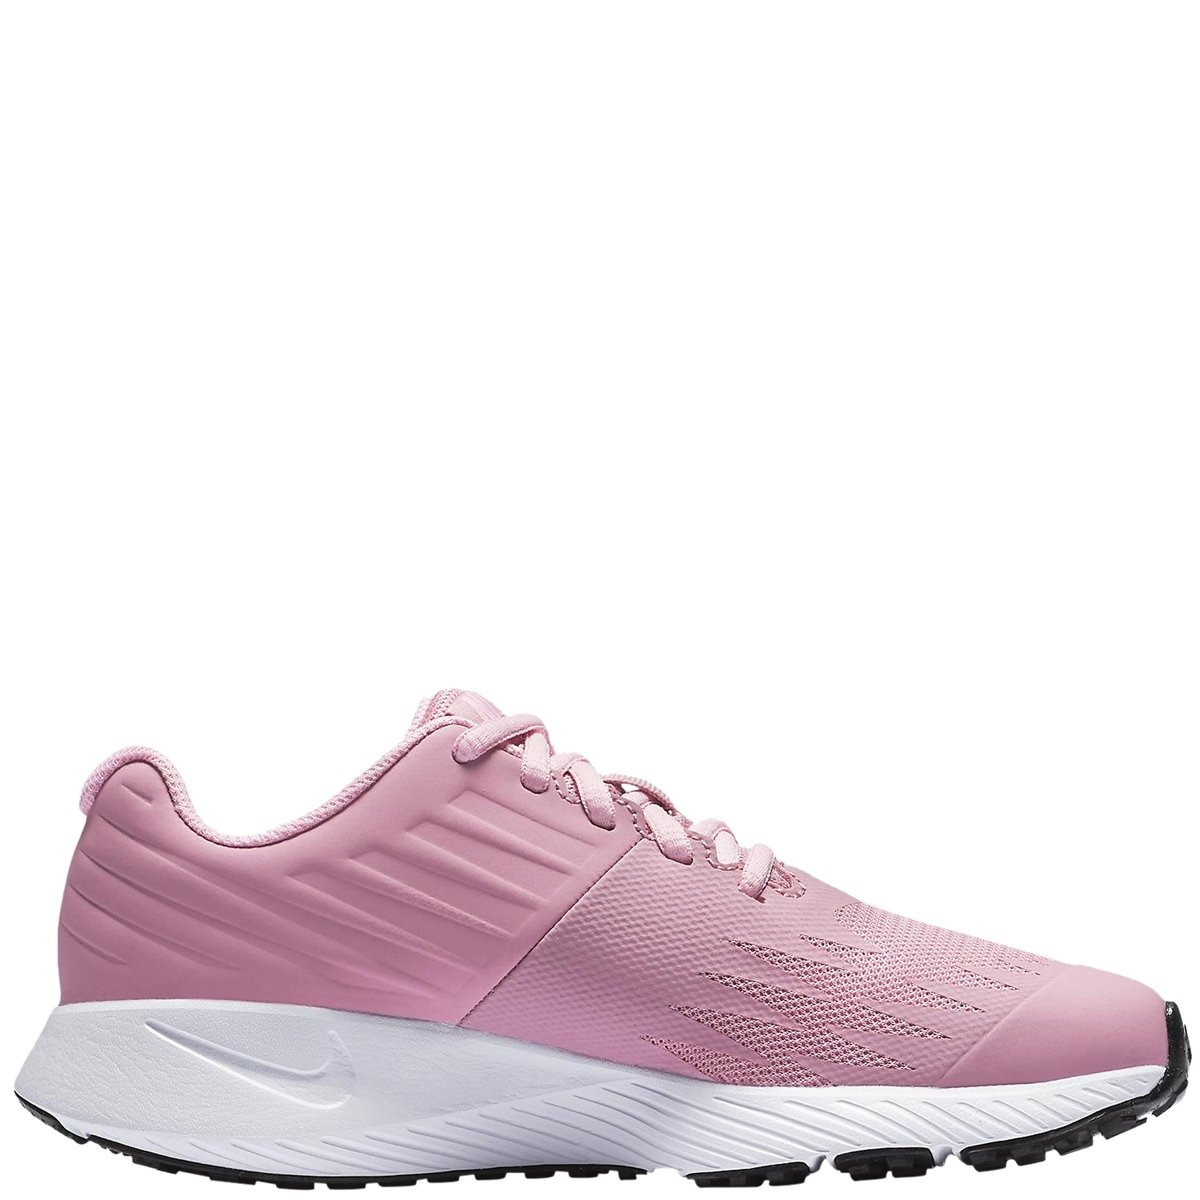 f4cb10f631 Tênis Feminino Nike Star Runner Gs - R$ 209,90 em Mercado Livre